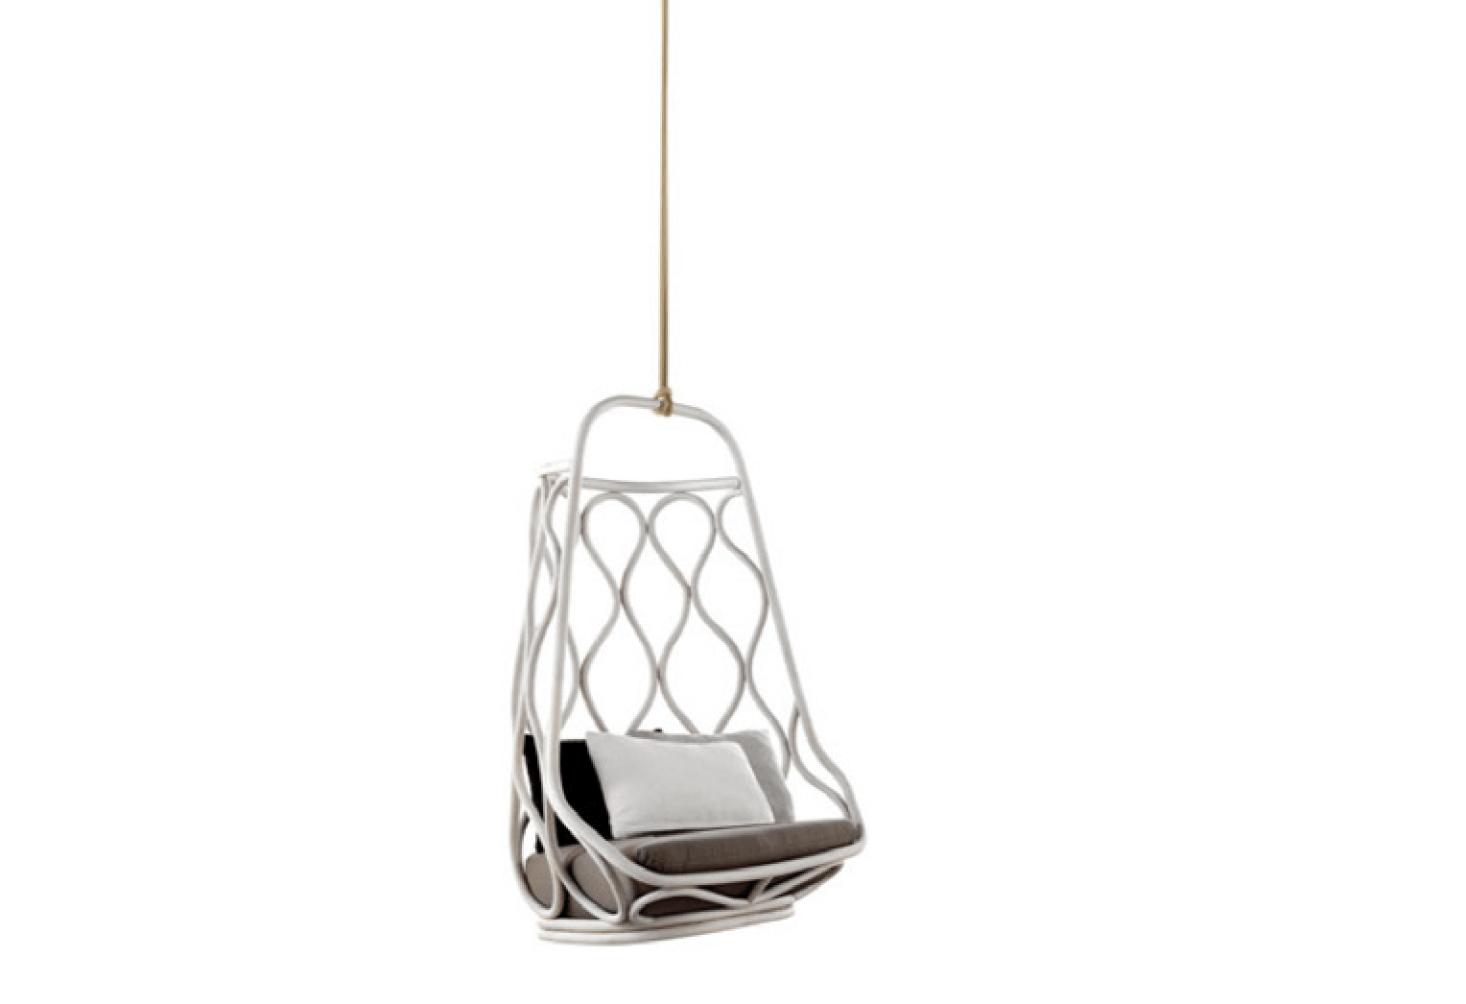 Amazing 10 Easy Pieces Rattan Hanging Chairs Gardenista Machost Co Dining Chair Design Ideas Machostcouk